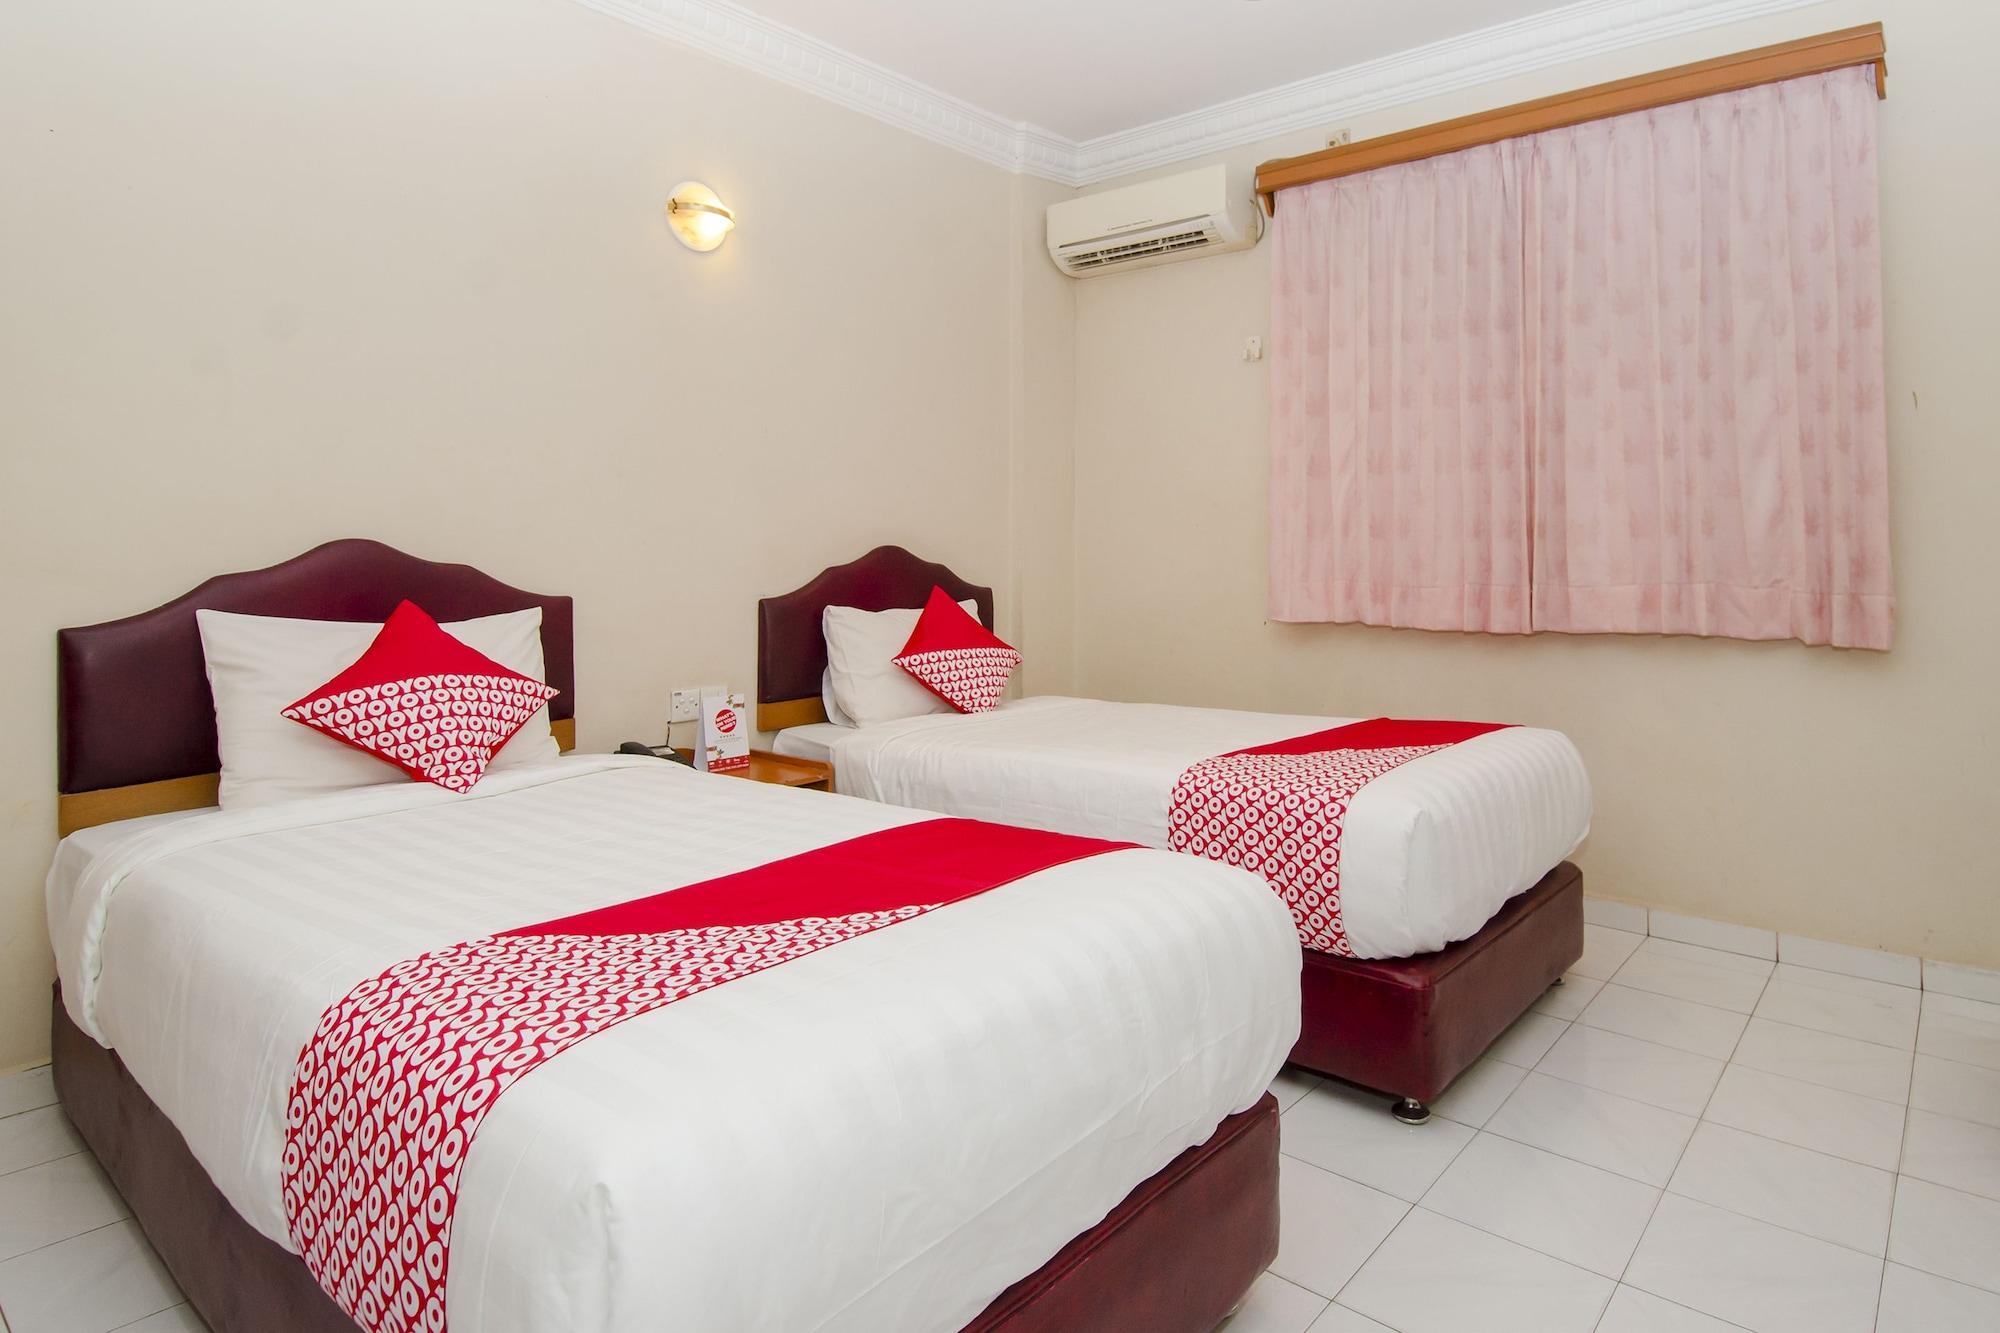 OYO 865 HALIM HOTEL, Tanjung Pinang